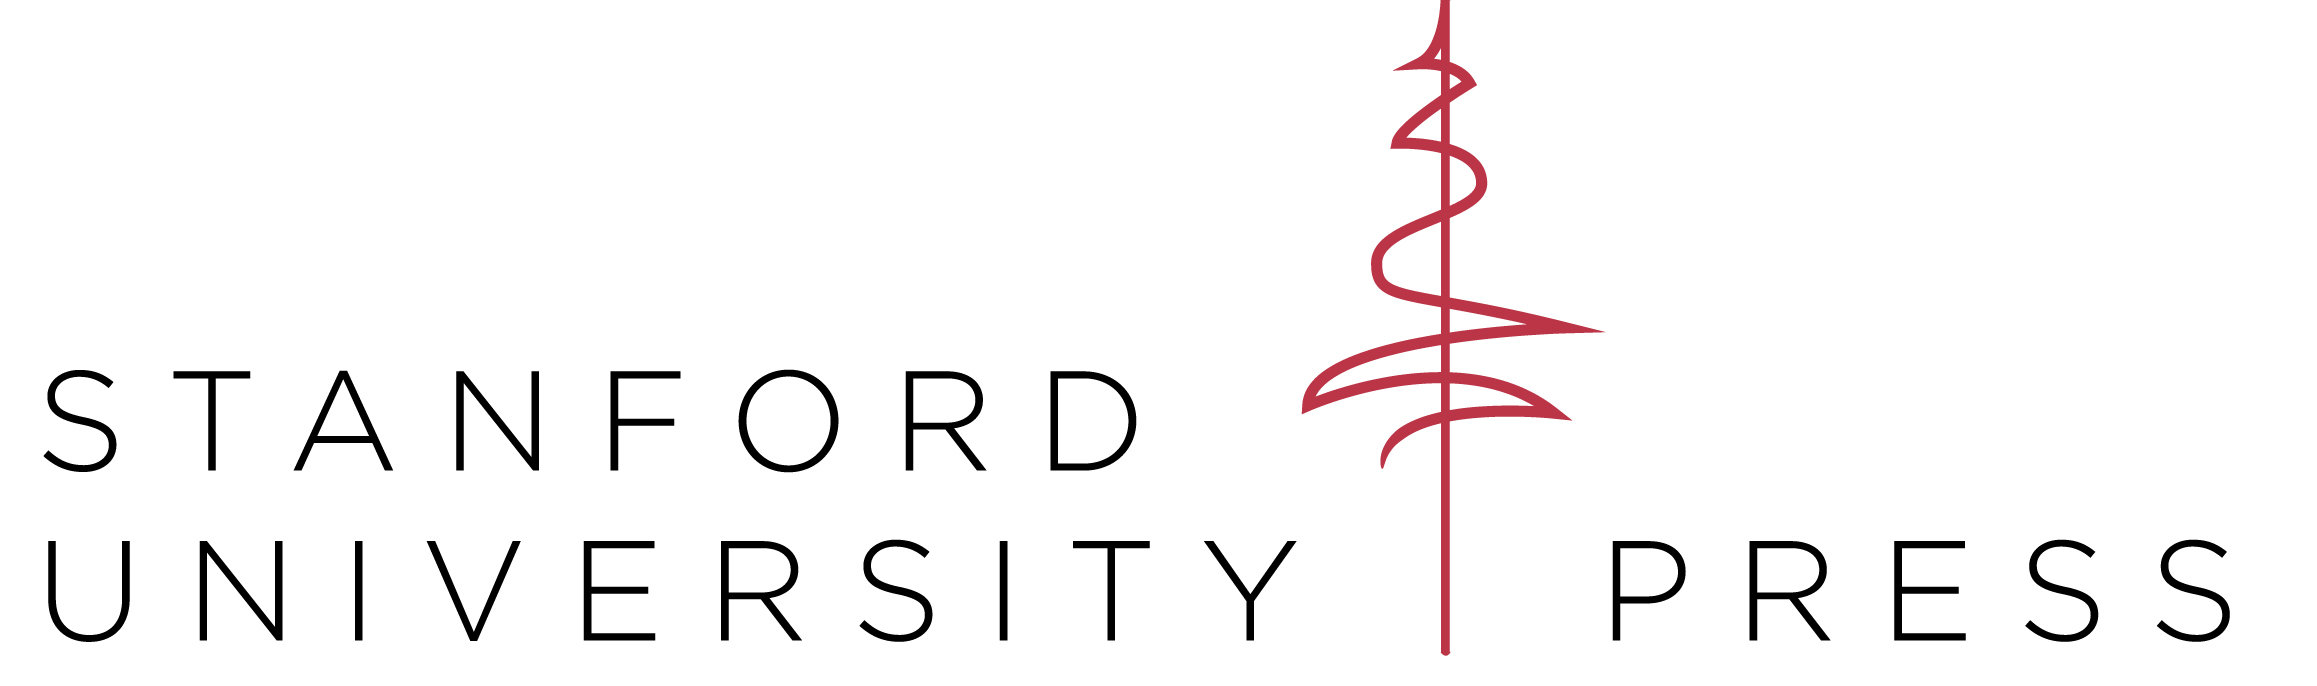 <p>Stanford University Press</p>